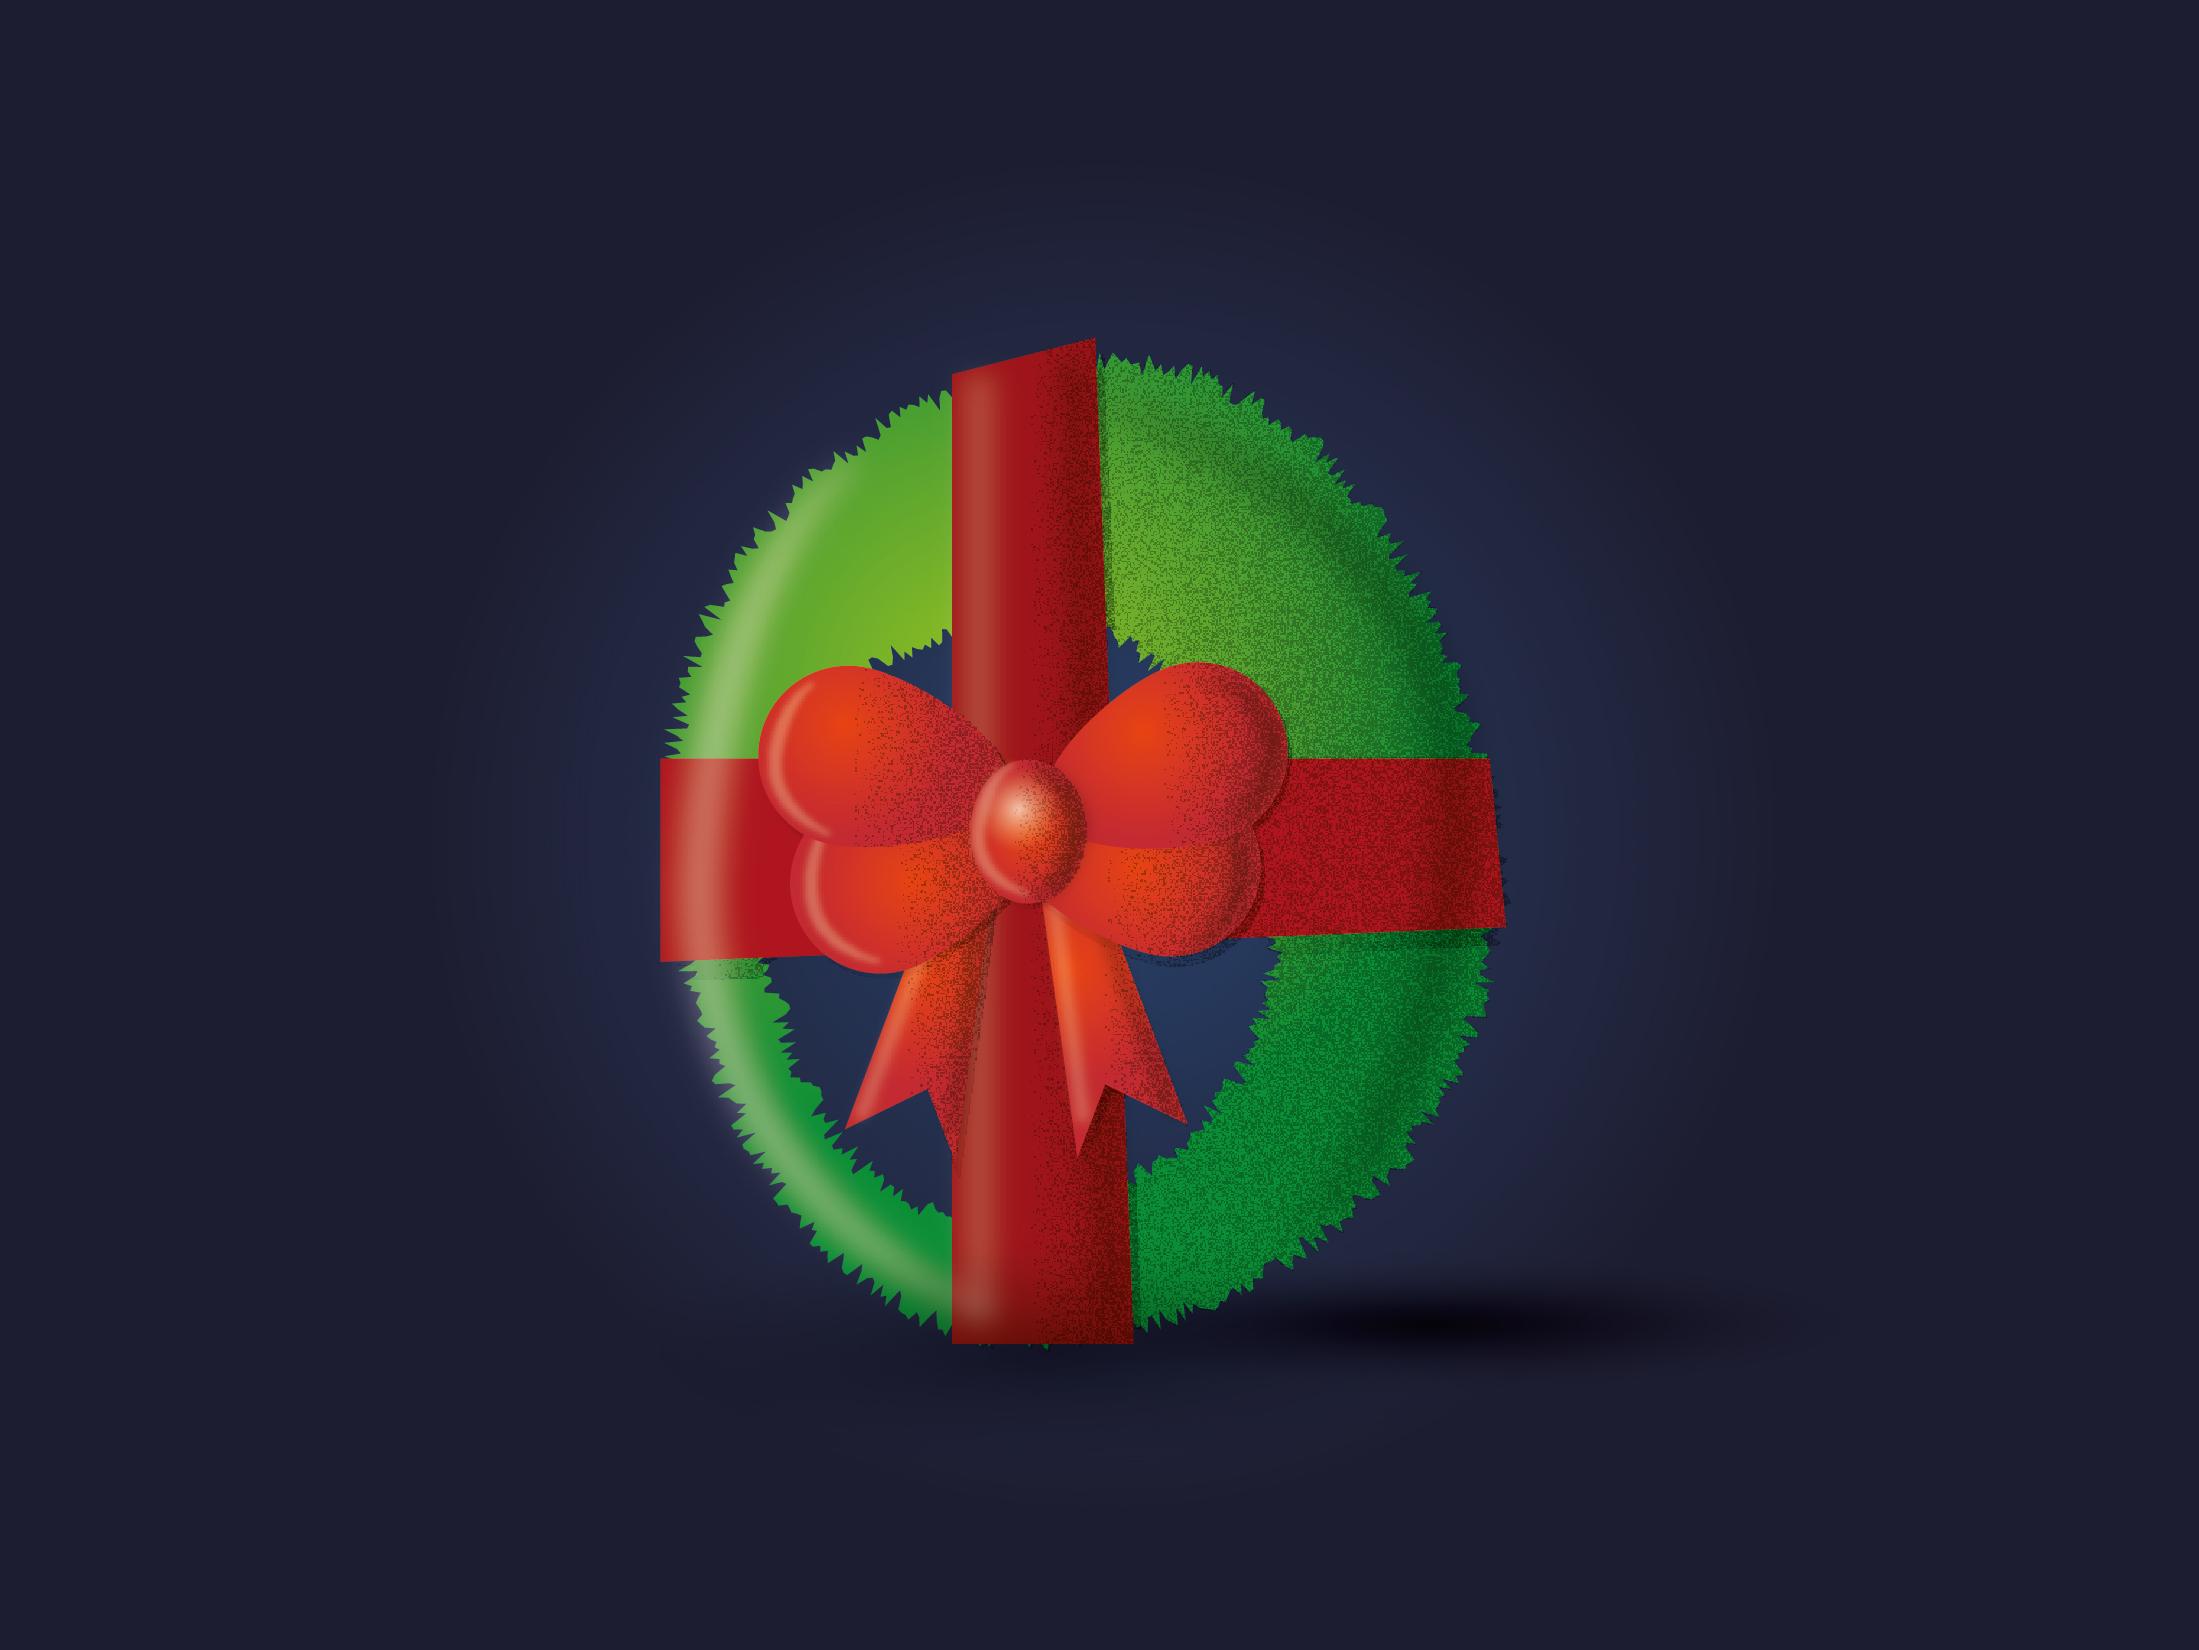 Ho ho no christmas kamila figura figured it out society 6 santa claus elf reindeer wreath grinch beh